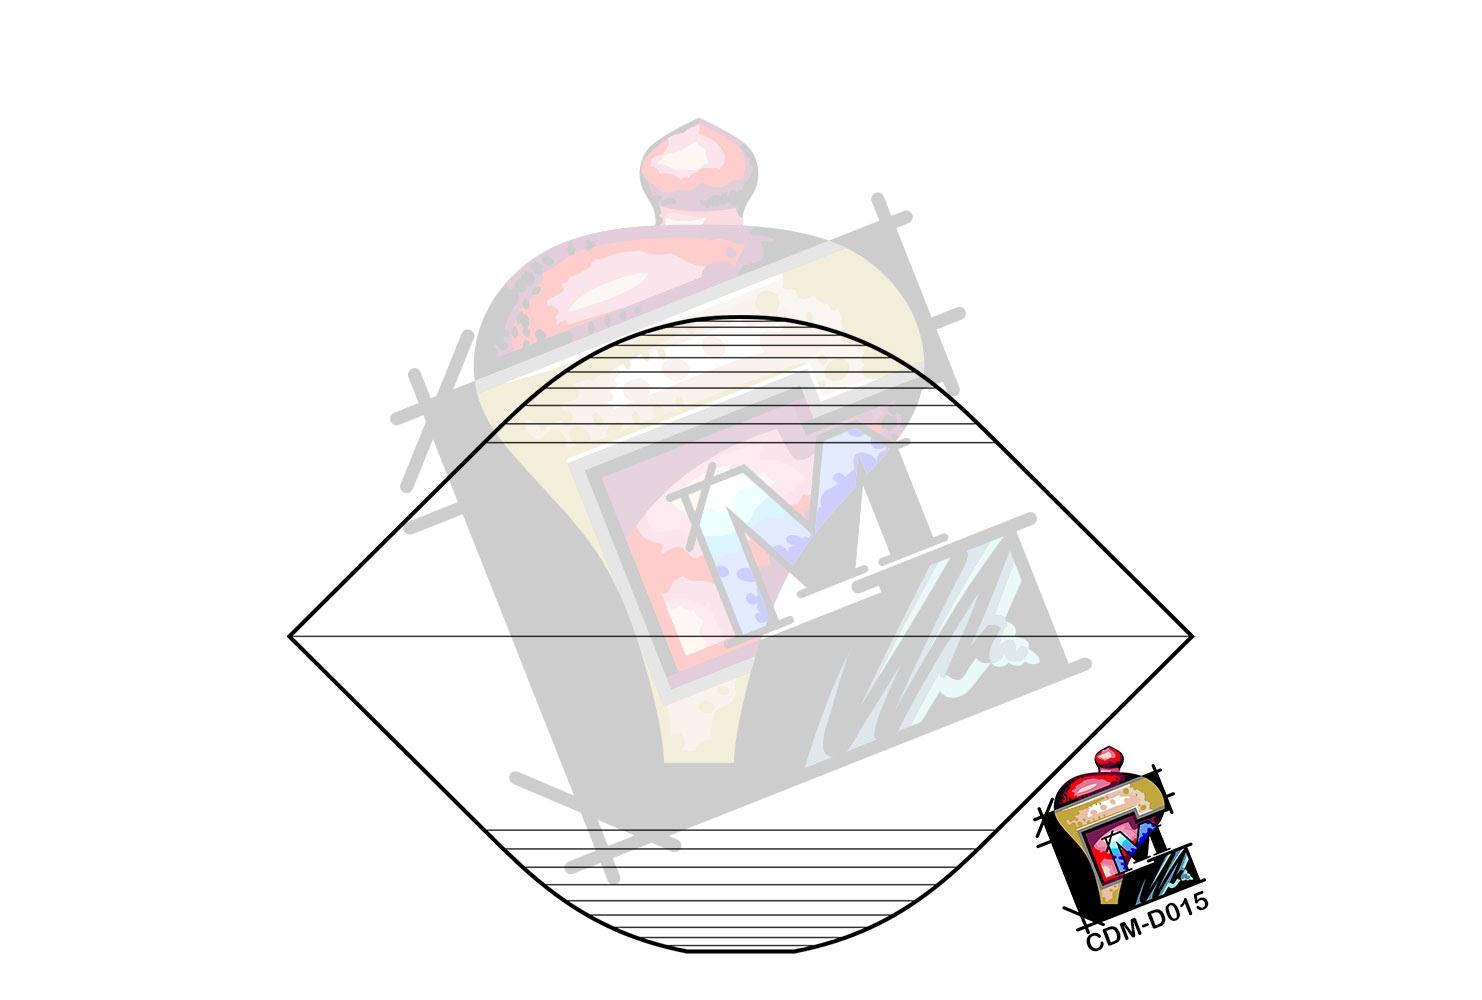 CDM-D015-10112016 - Pontos